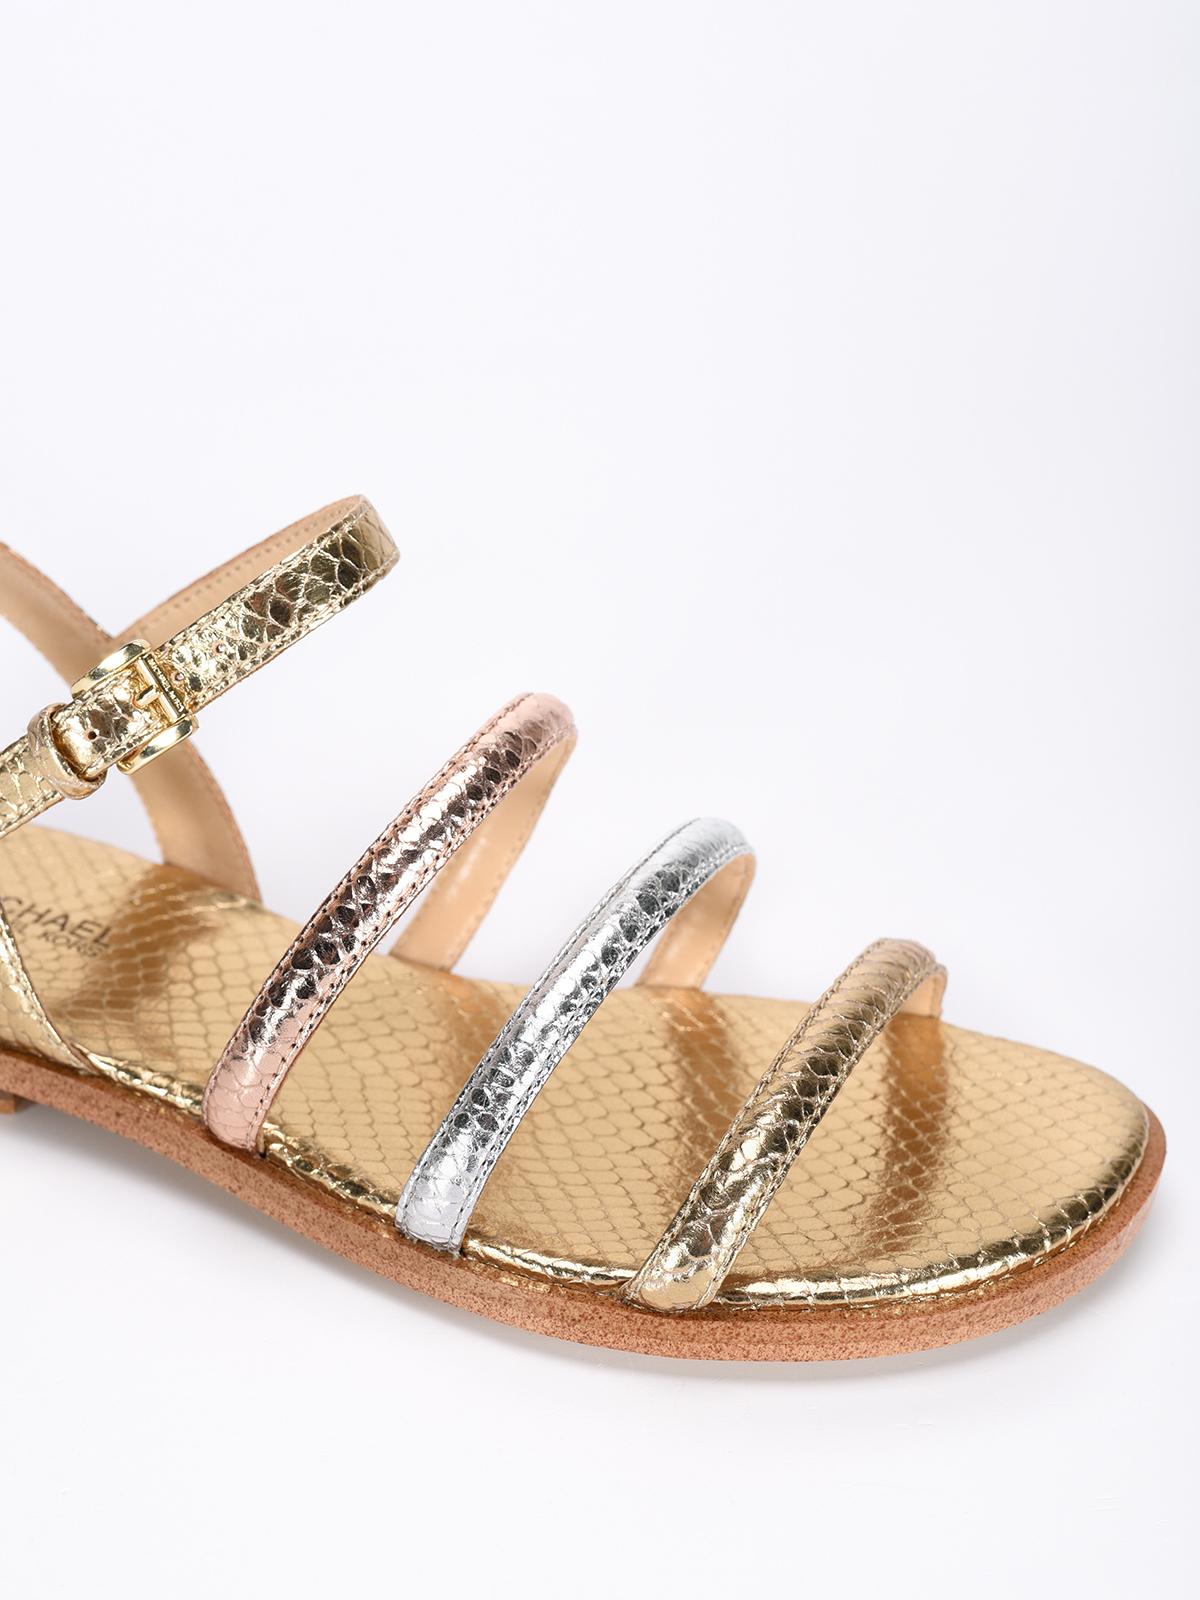 42868529658a Michael Kors - Nantucket flat sandals - sandals - 40S7NAFA4M